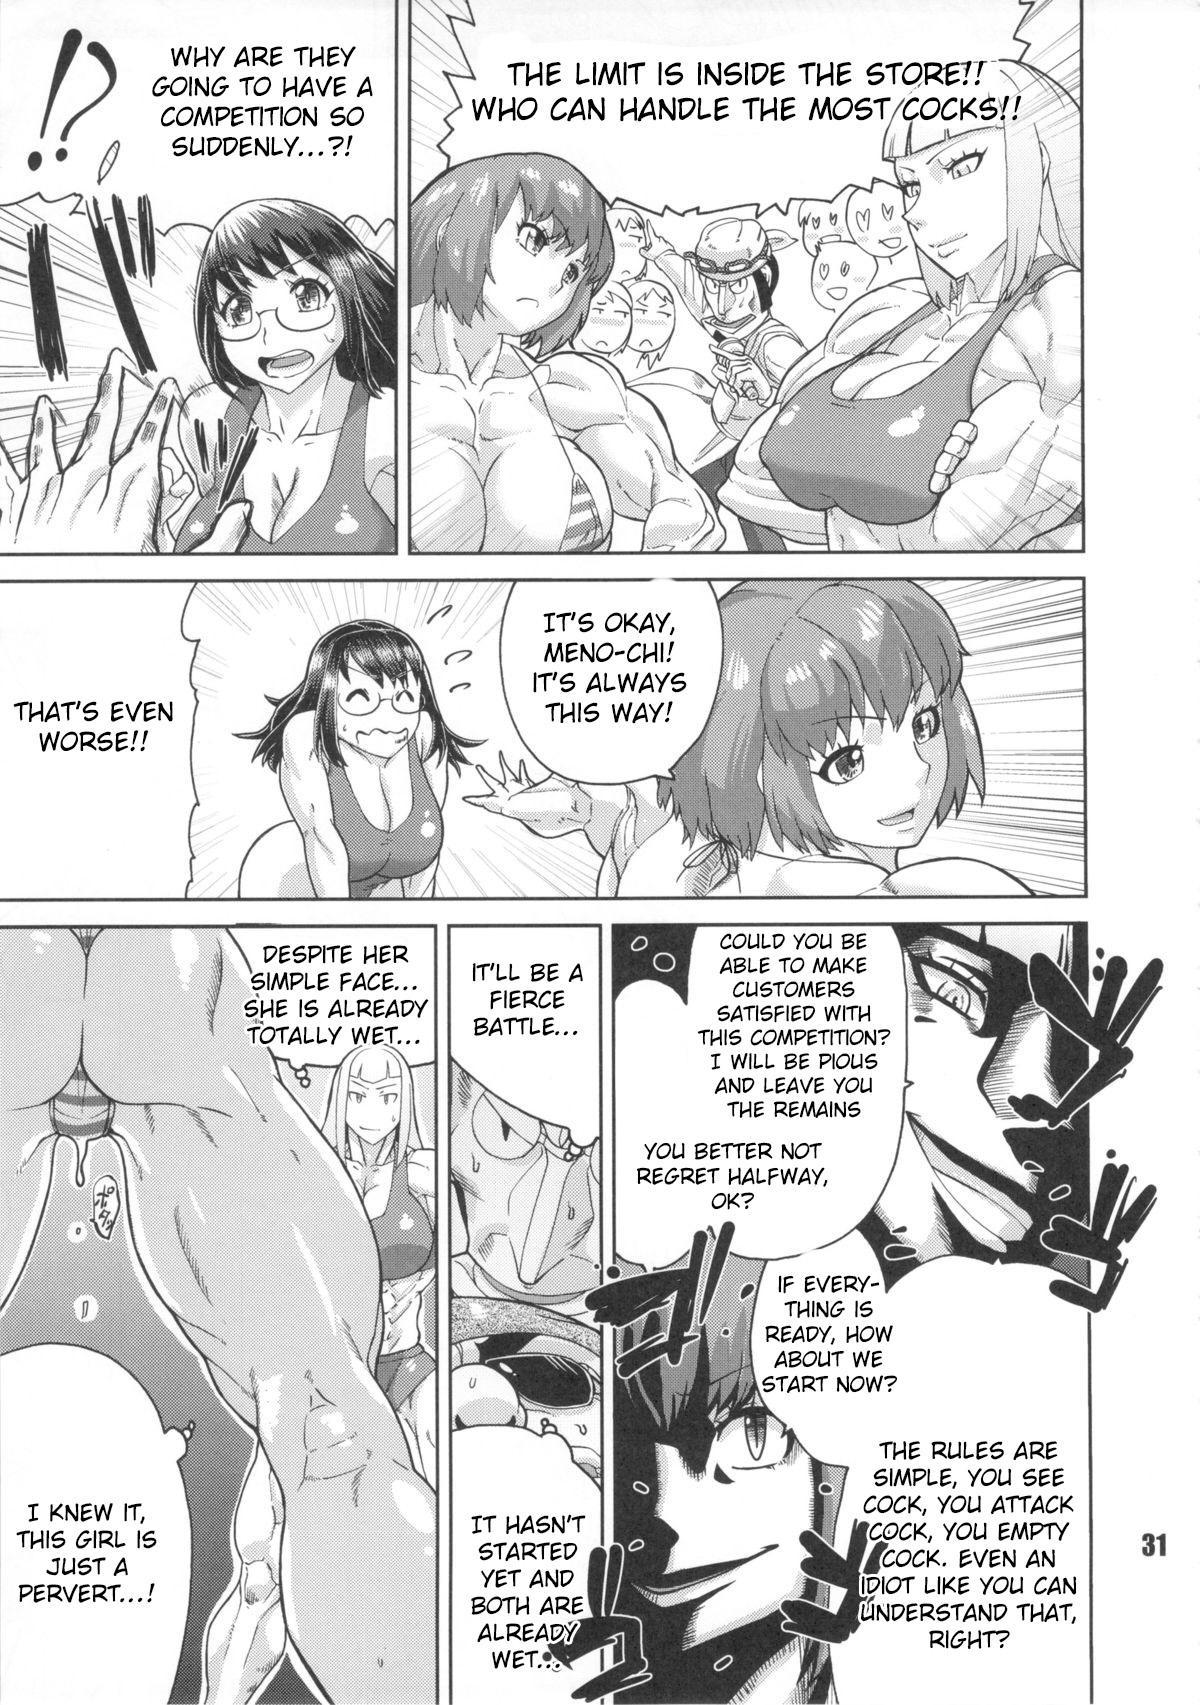 Magic Muscle Girl Six Pack / Jackasss (nWa 7th in Light Heavyweight) ENG (NEO-QUEENDOM Vol. 8) [Raknnkarscans] 2